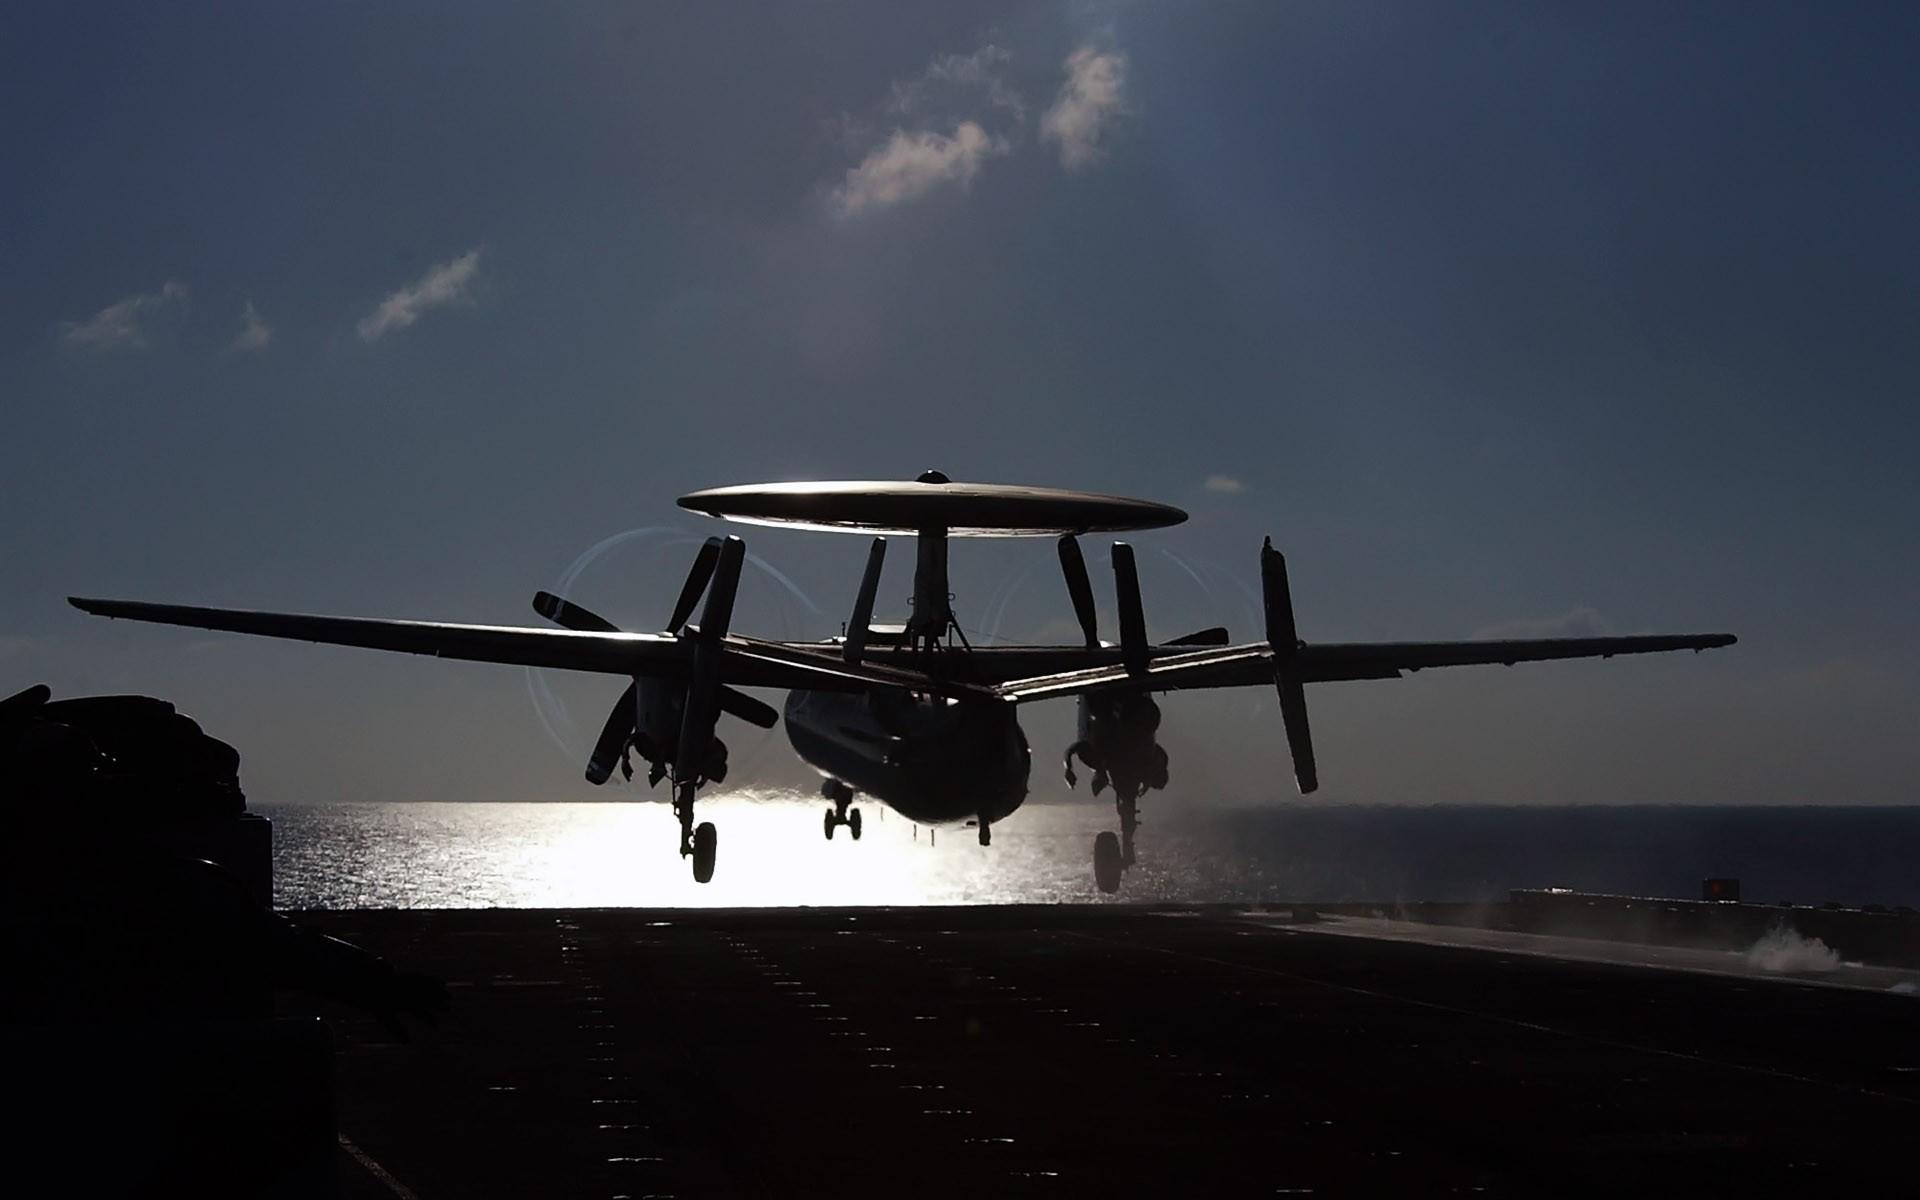 Airplane Warplanes Military Aircraft Aircraft Vehicle 1920x1200